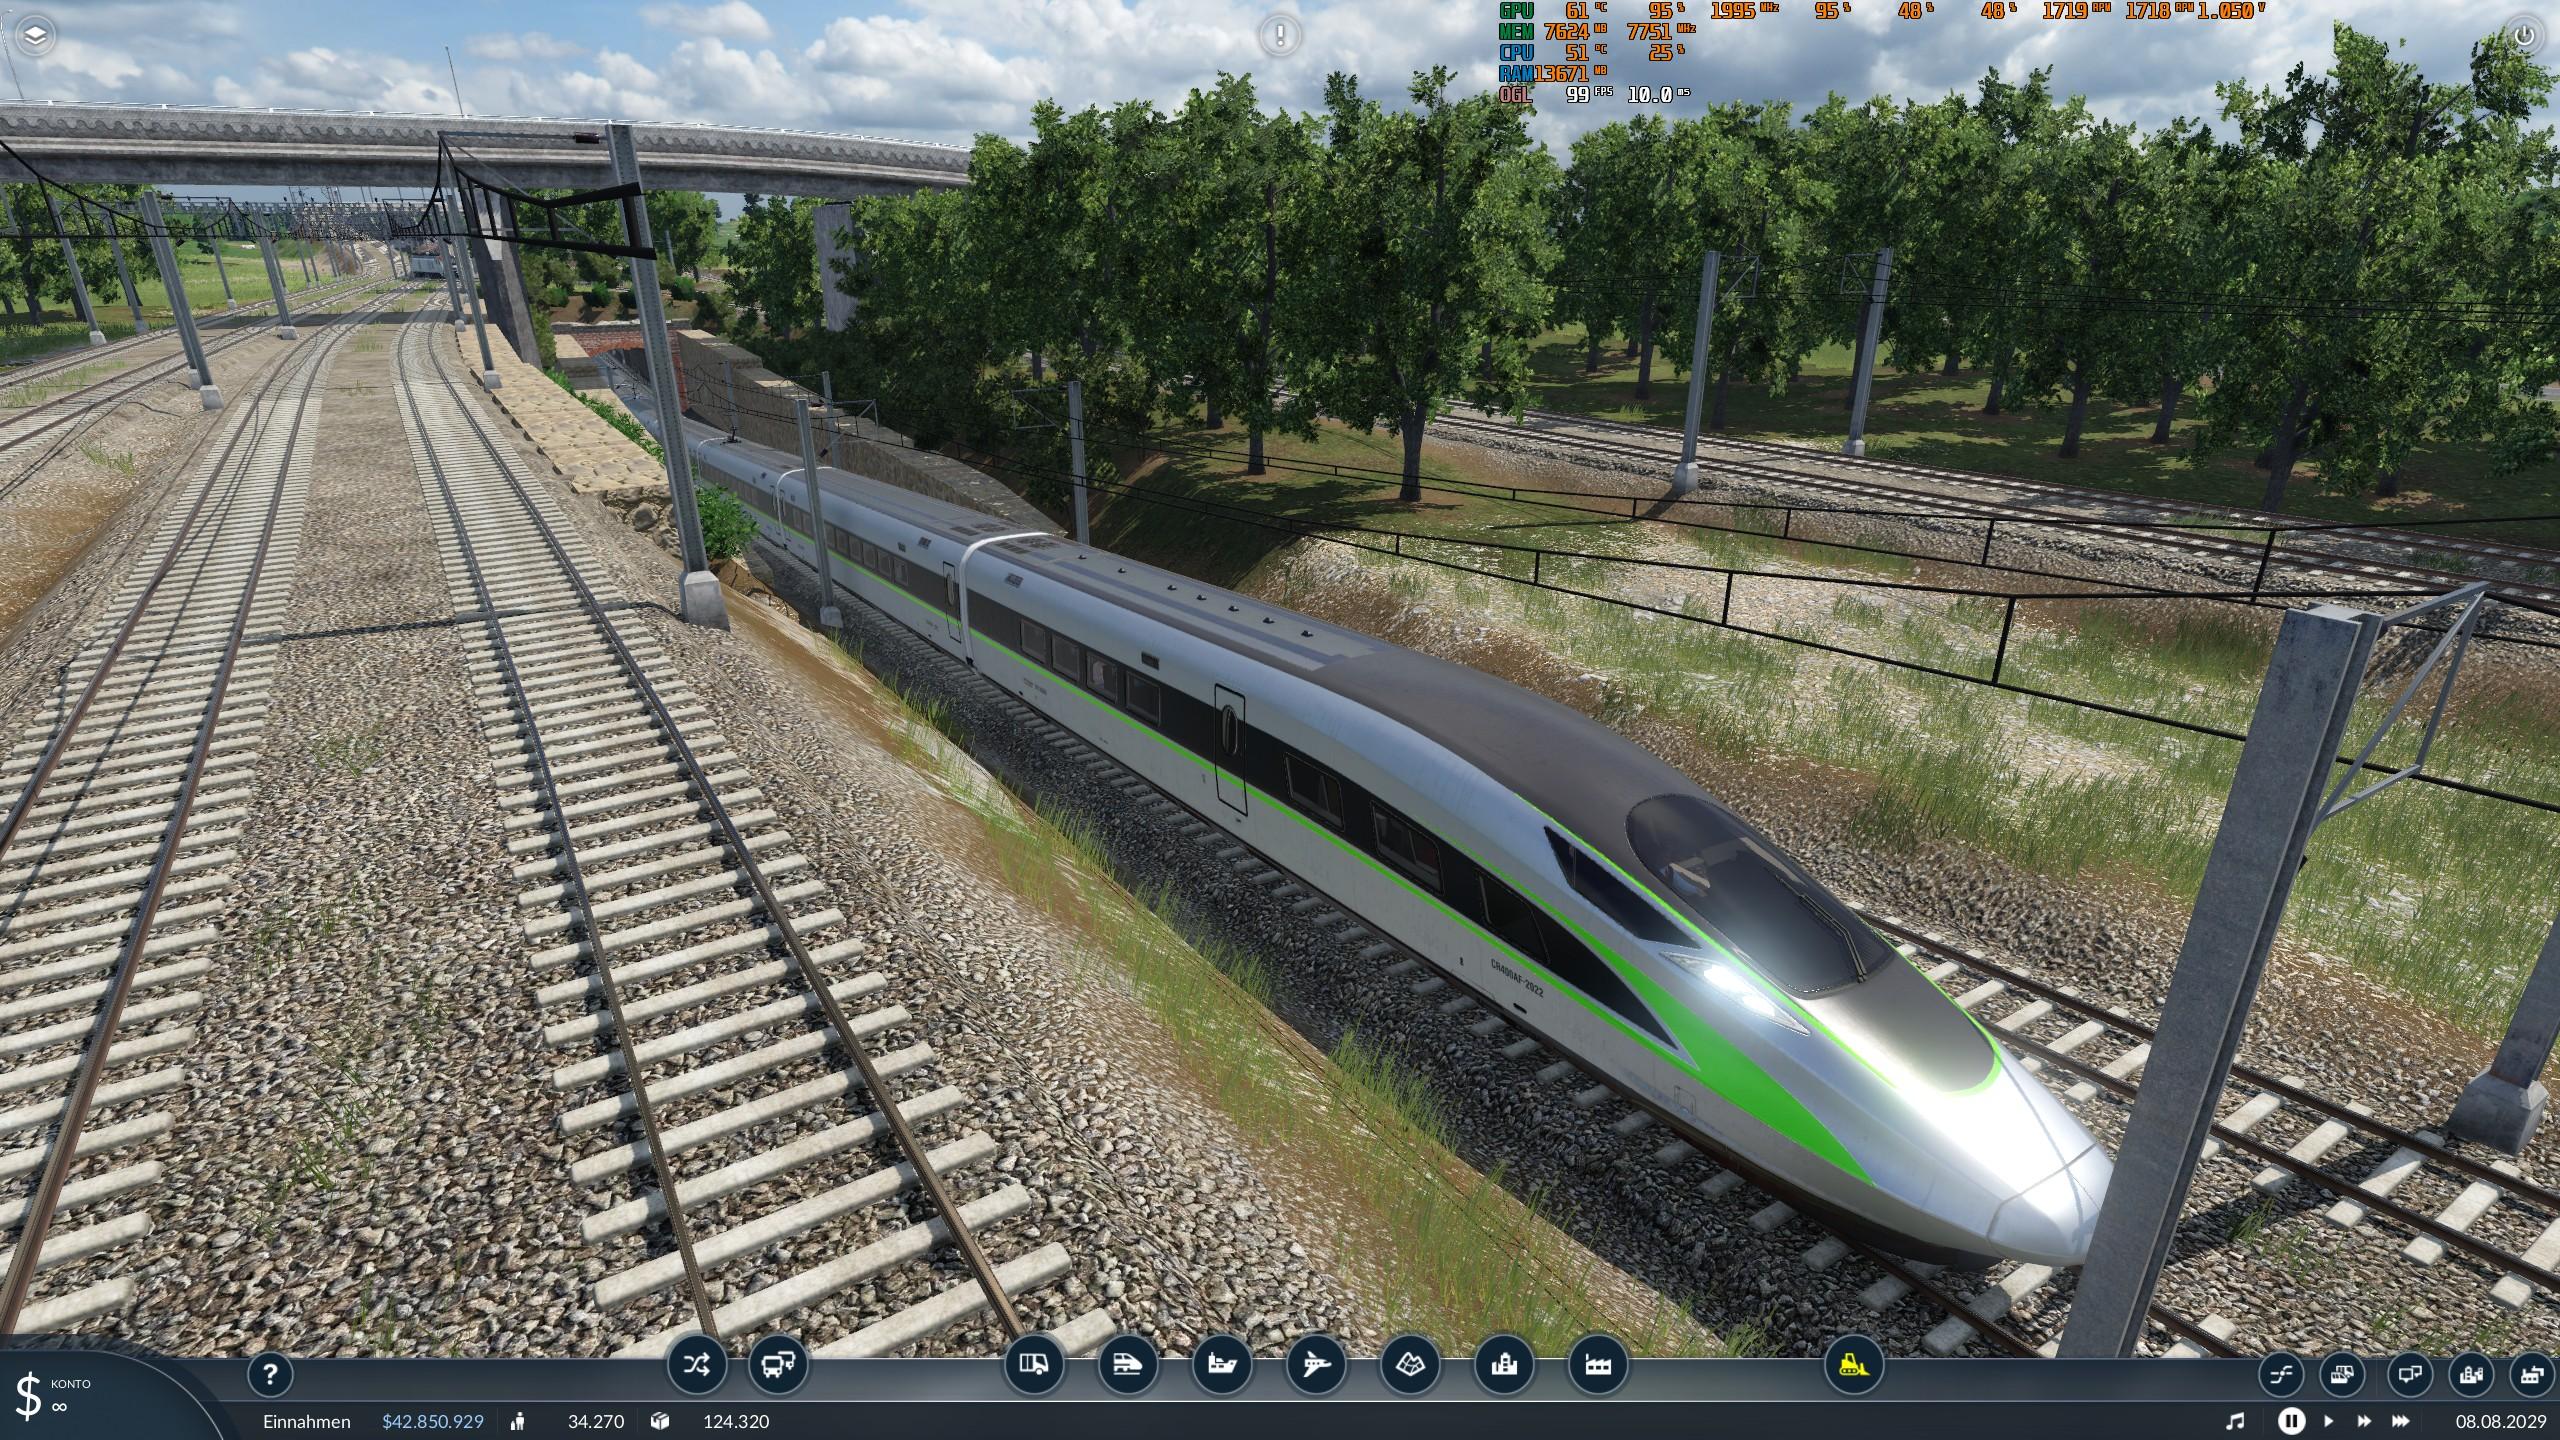 TransportFever2_2020_05_18_23_43_07_051.jpg